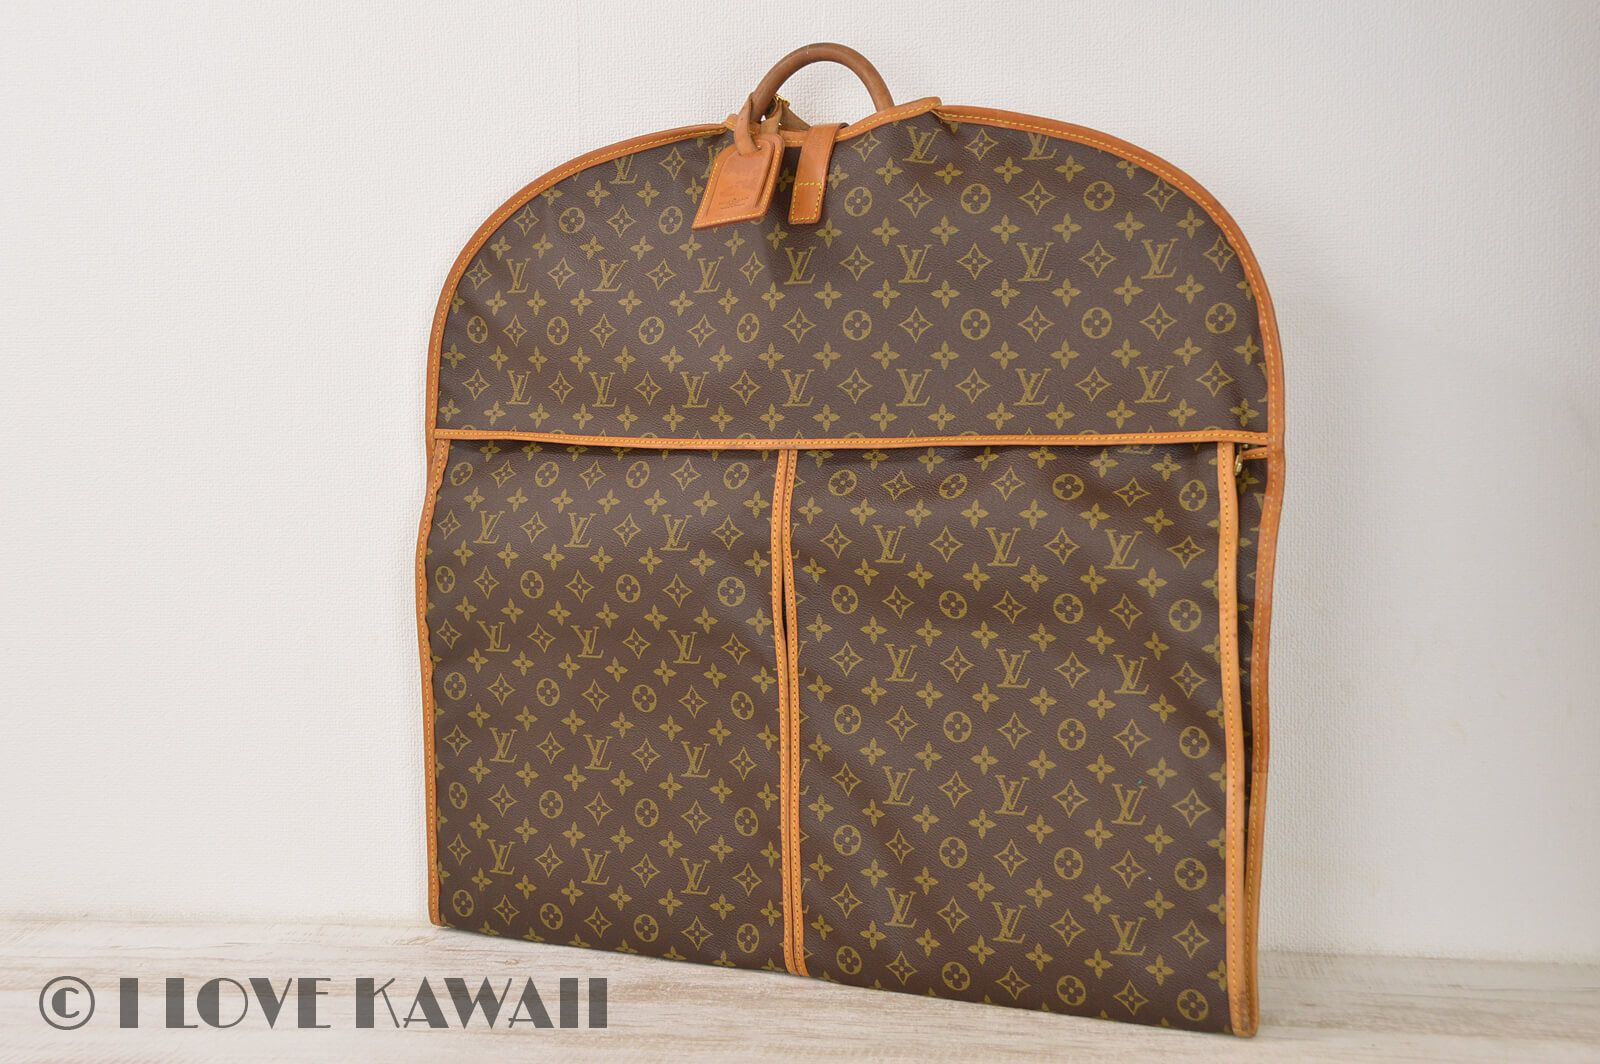 Louis Vuitton Monogram Usu Porto Habit For Man Garment Bag M23434